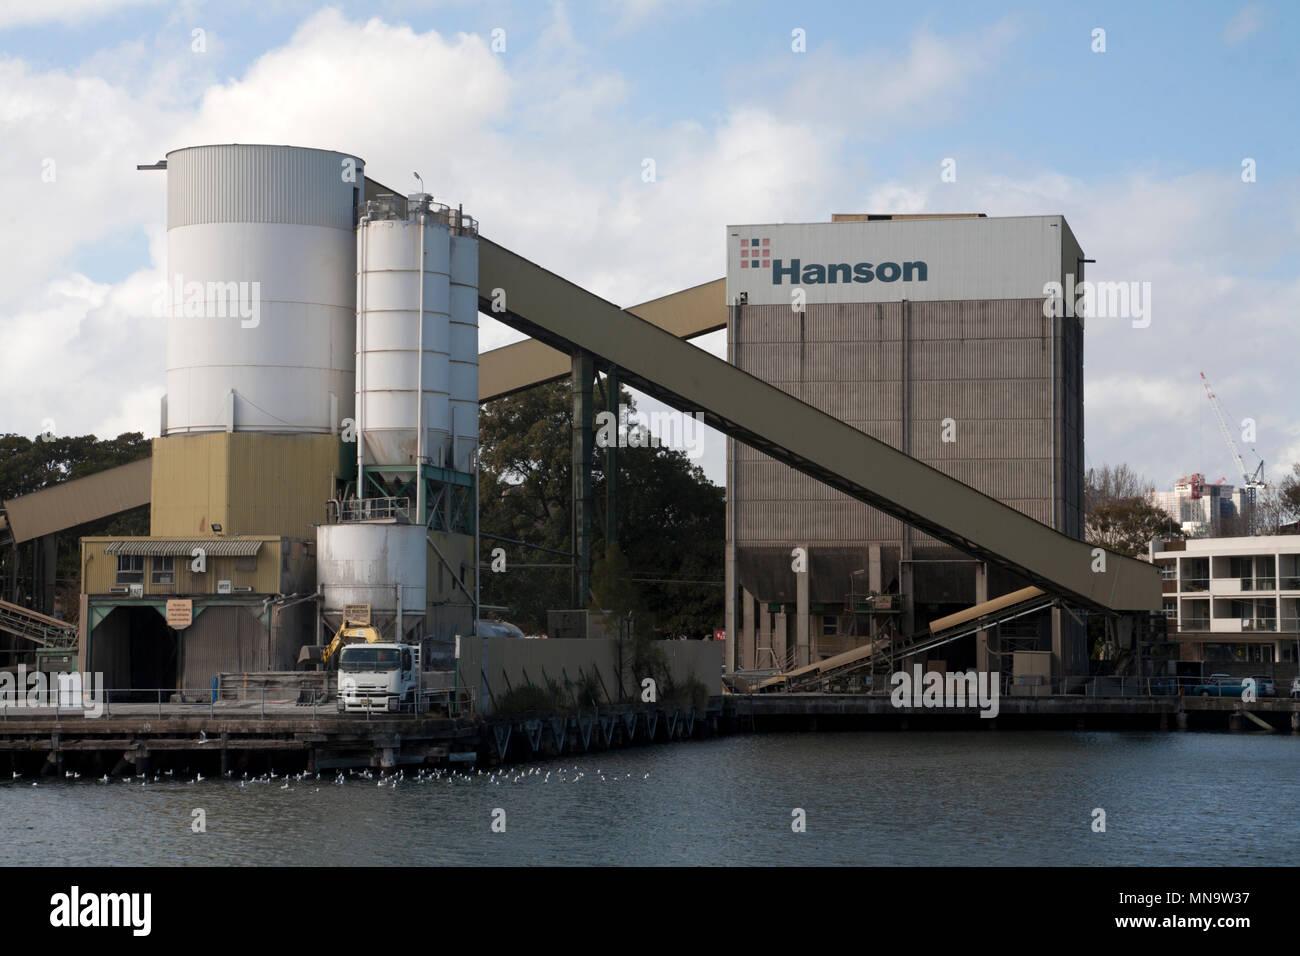 Hanson Cement Stock Photos & Hanson Cement Stock Images - Alamy